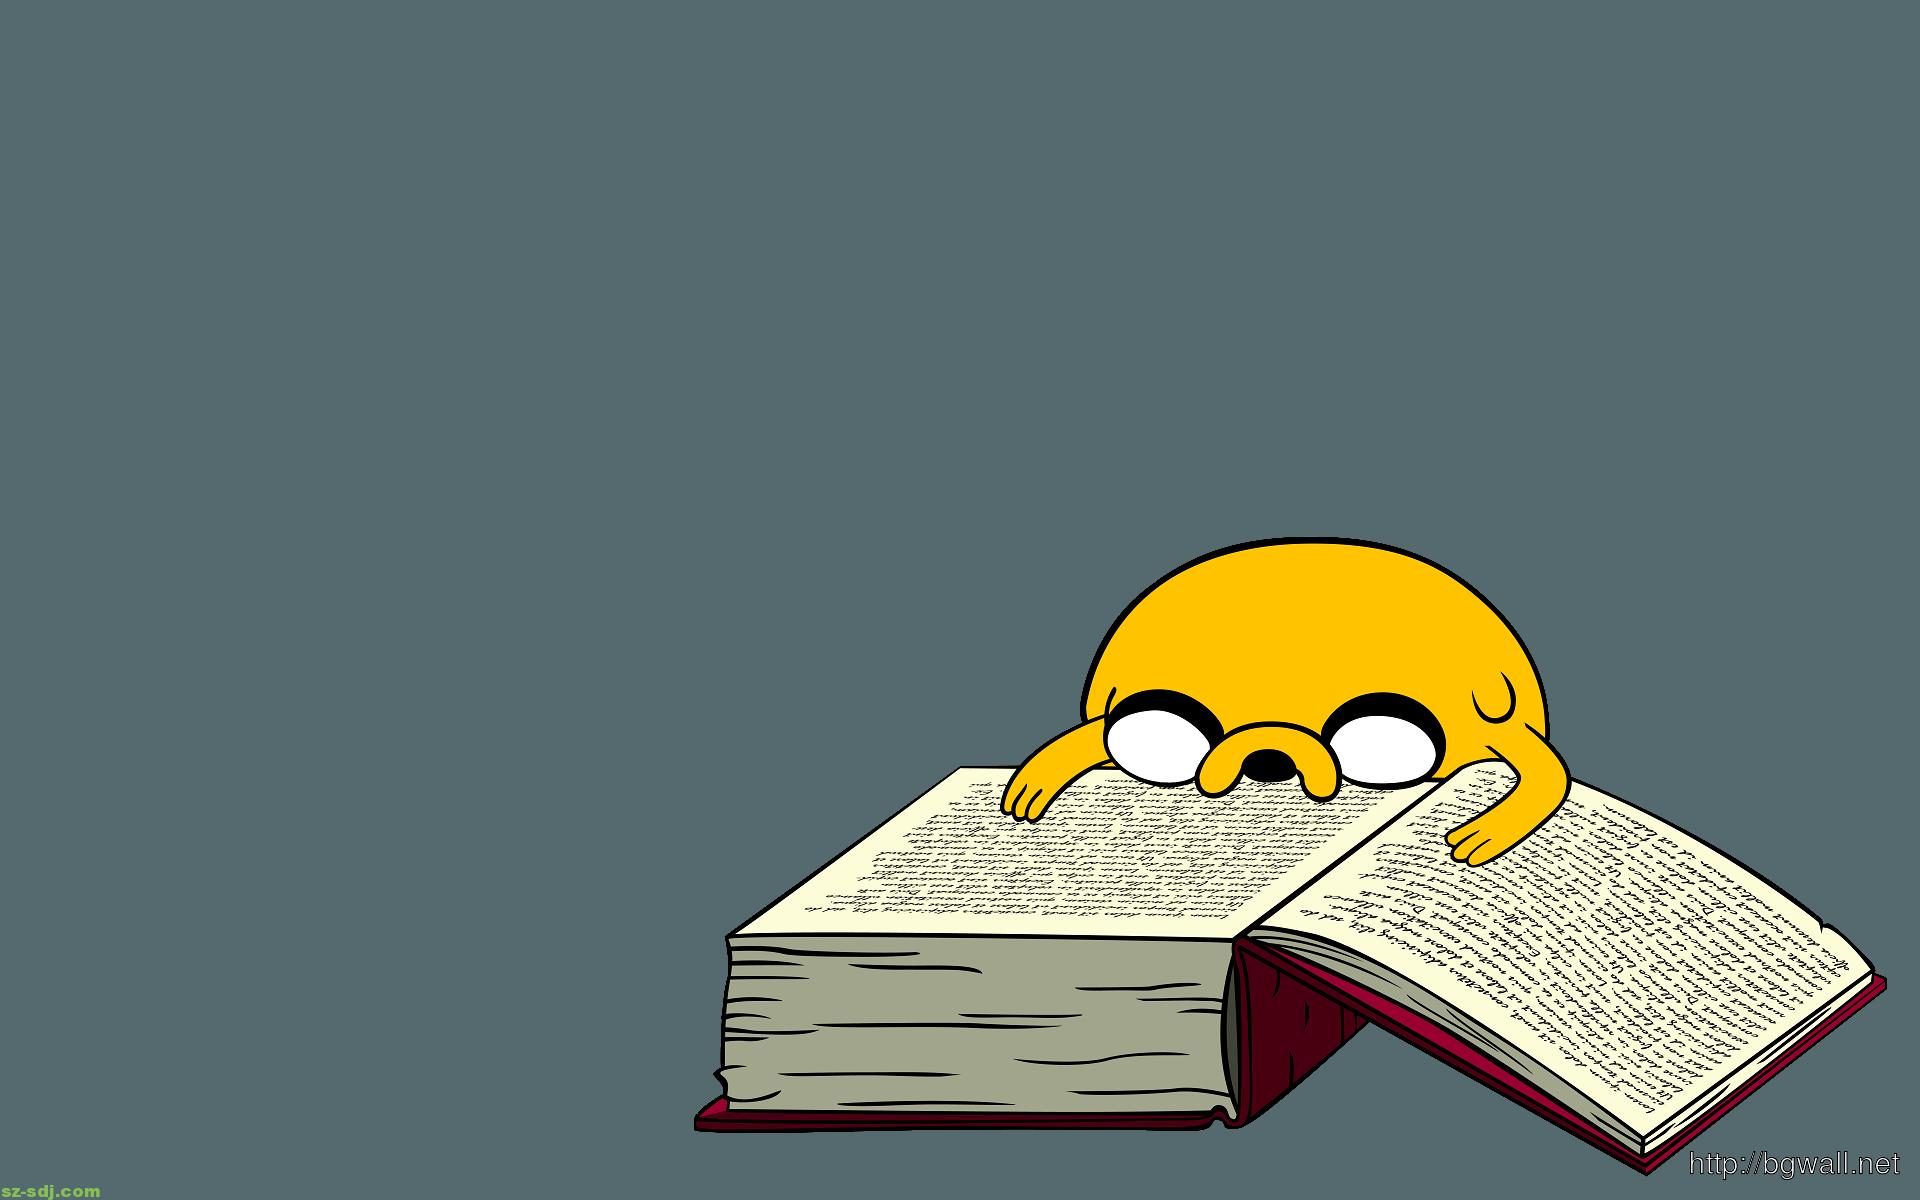 Cute Cartoon Adventure Time Wallpaper Background Wallpaper Hd